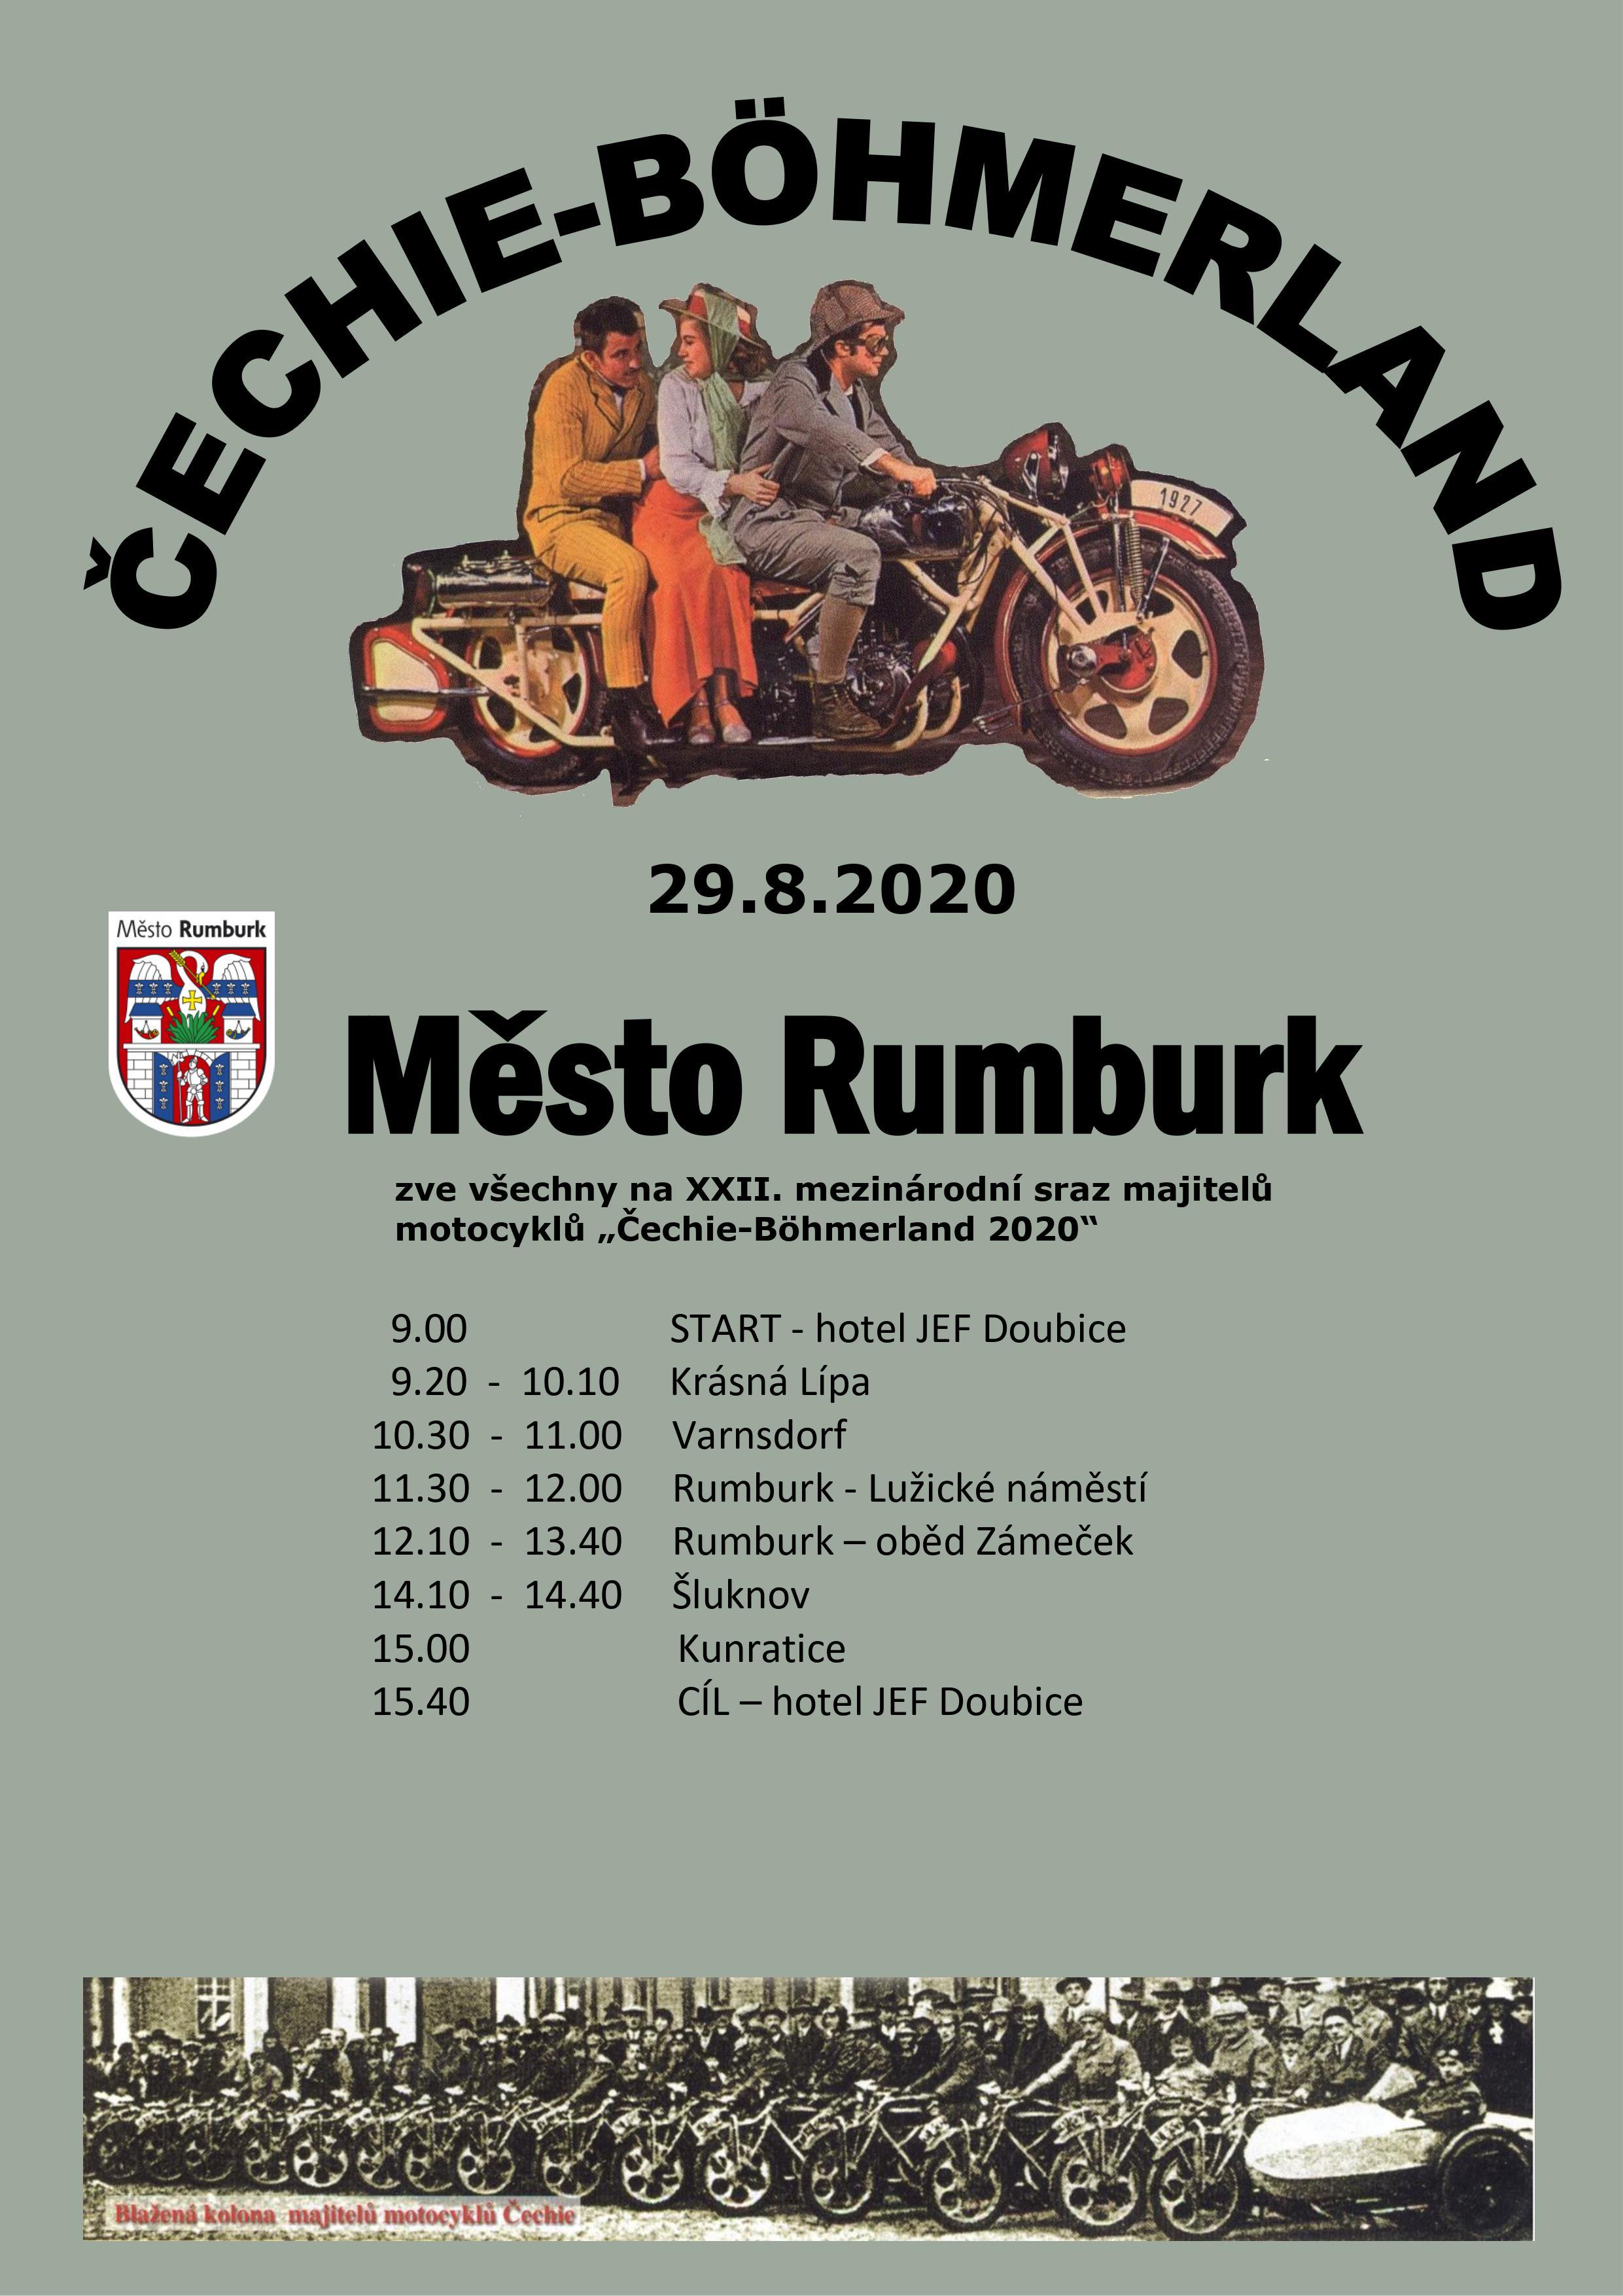 Čechie-Böhmerland 2020